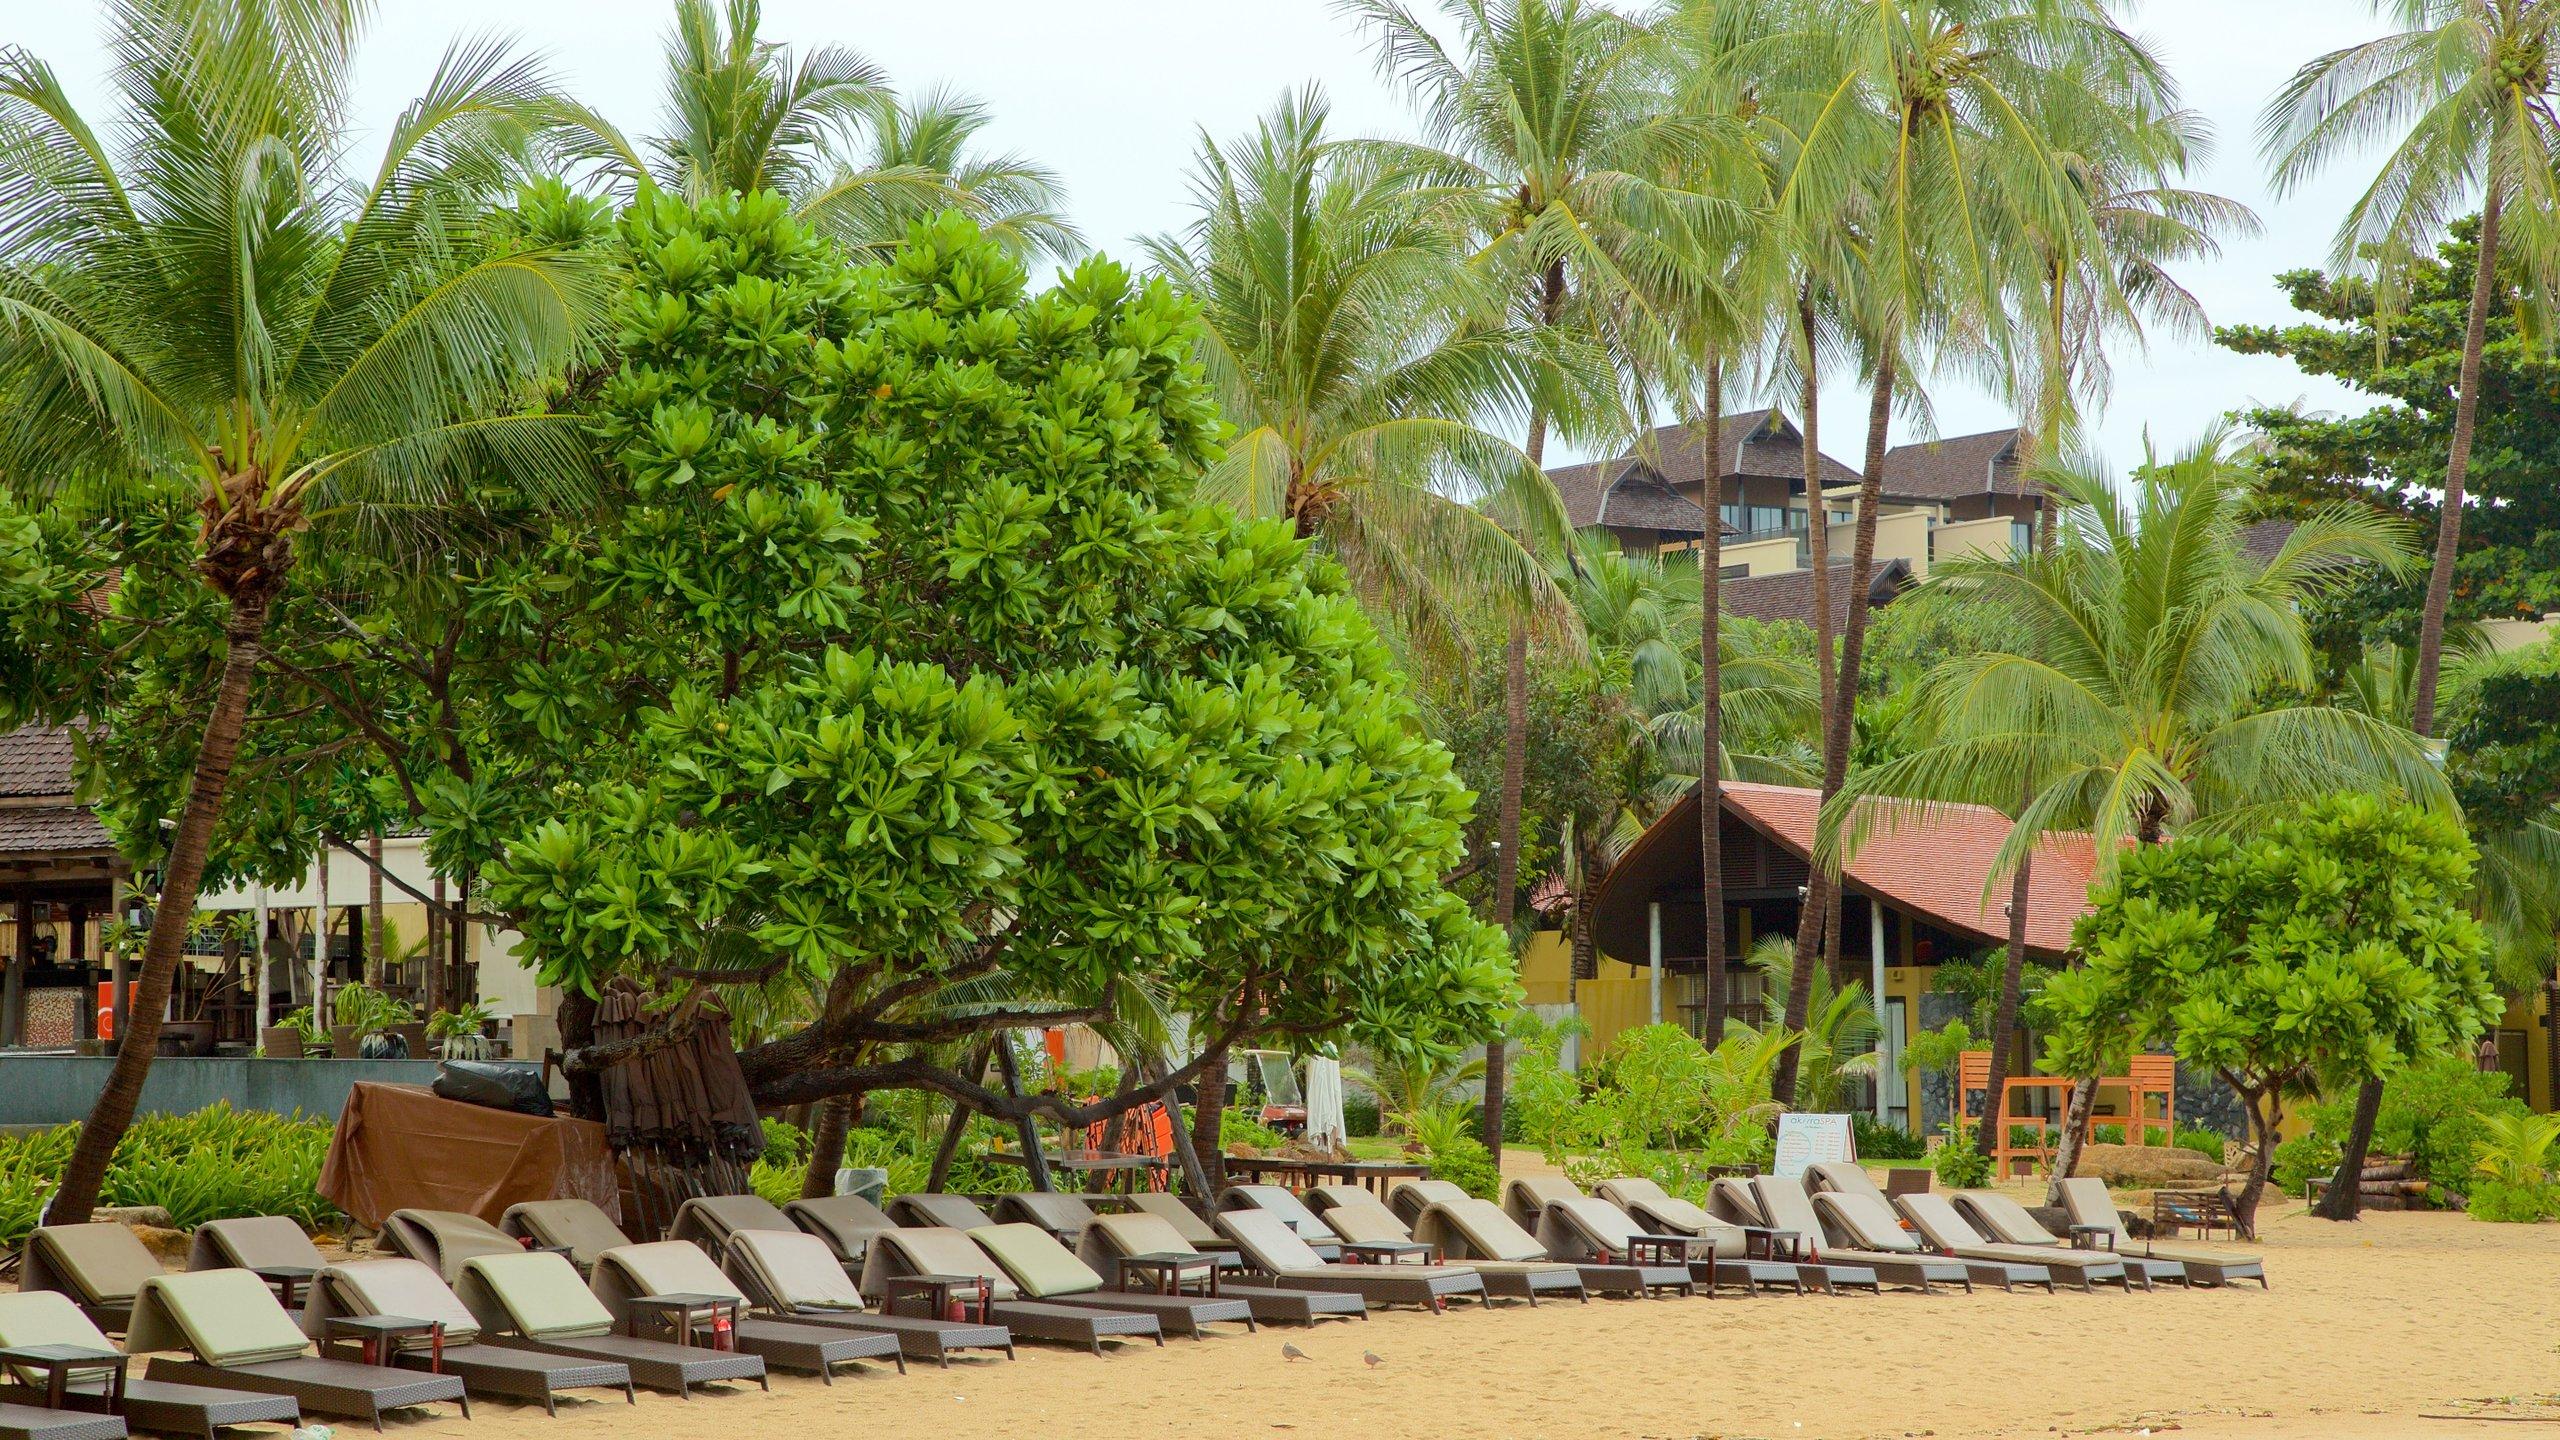 Lamai, Koh Samui, Surat Thani Province, Thailand